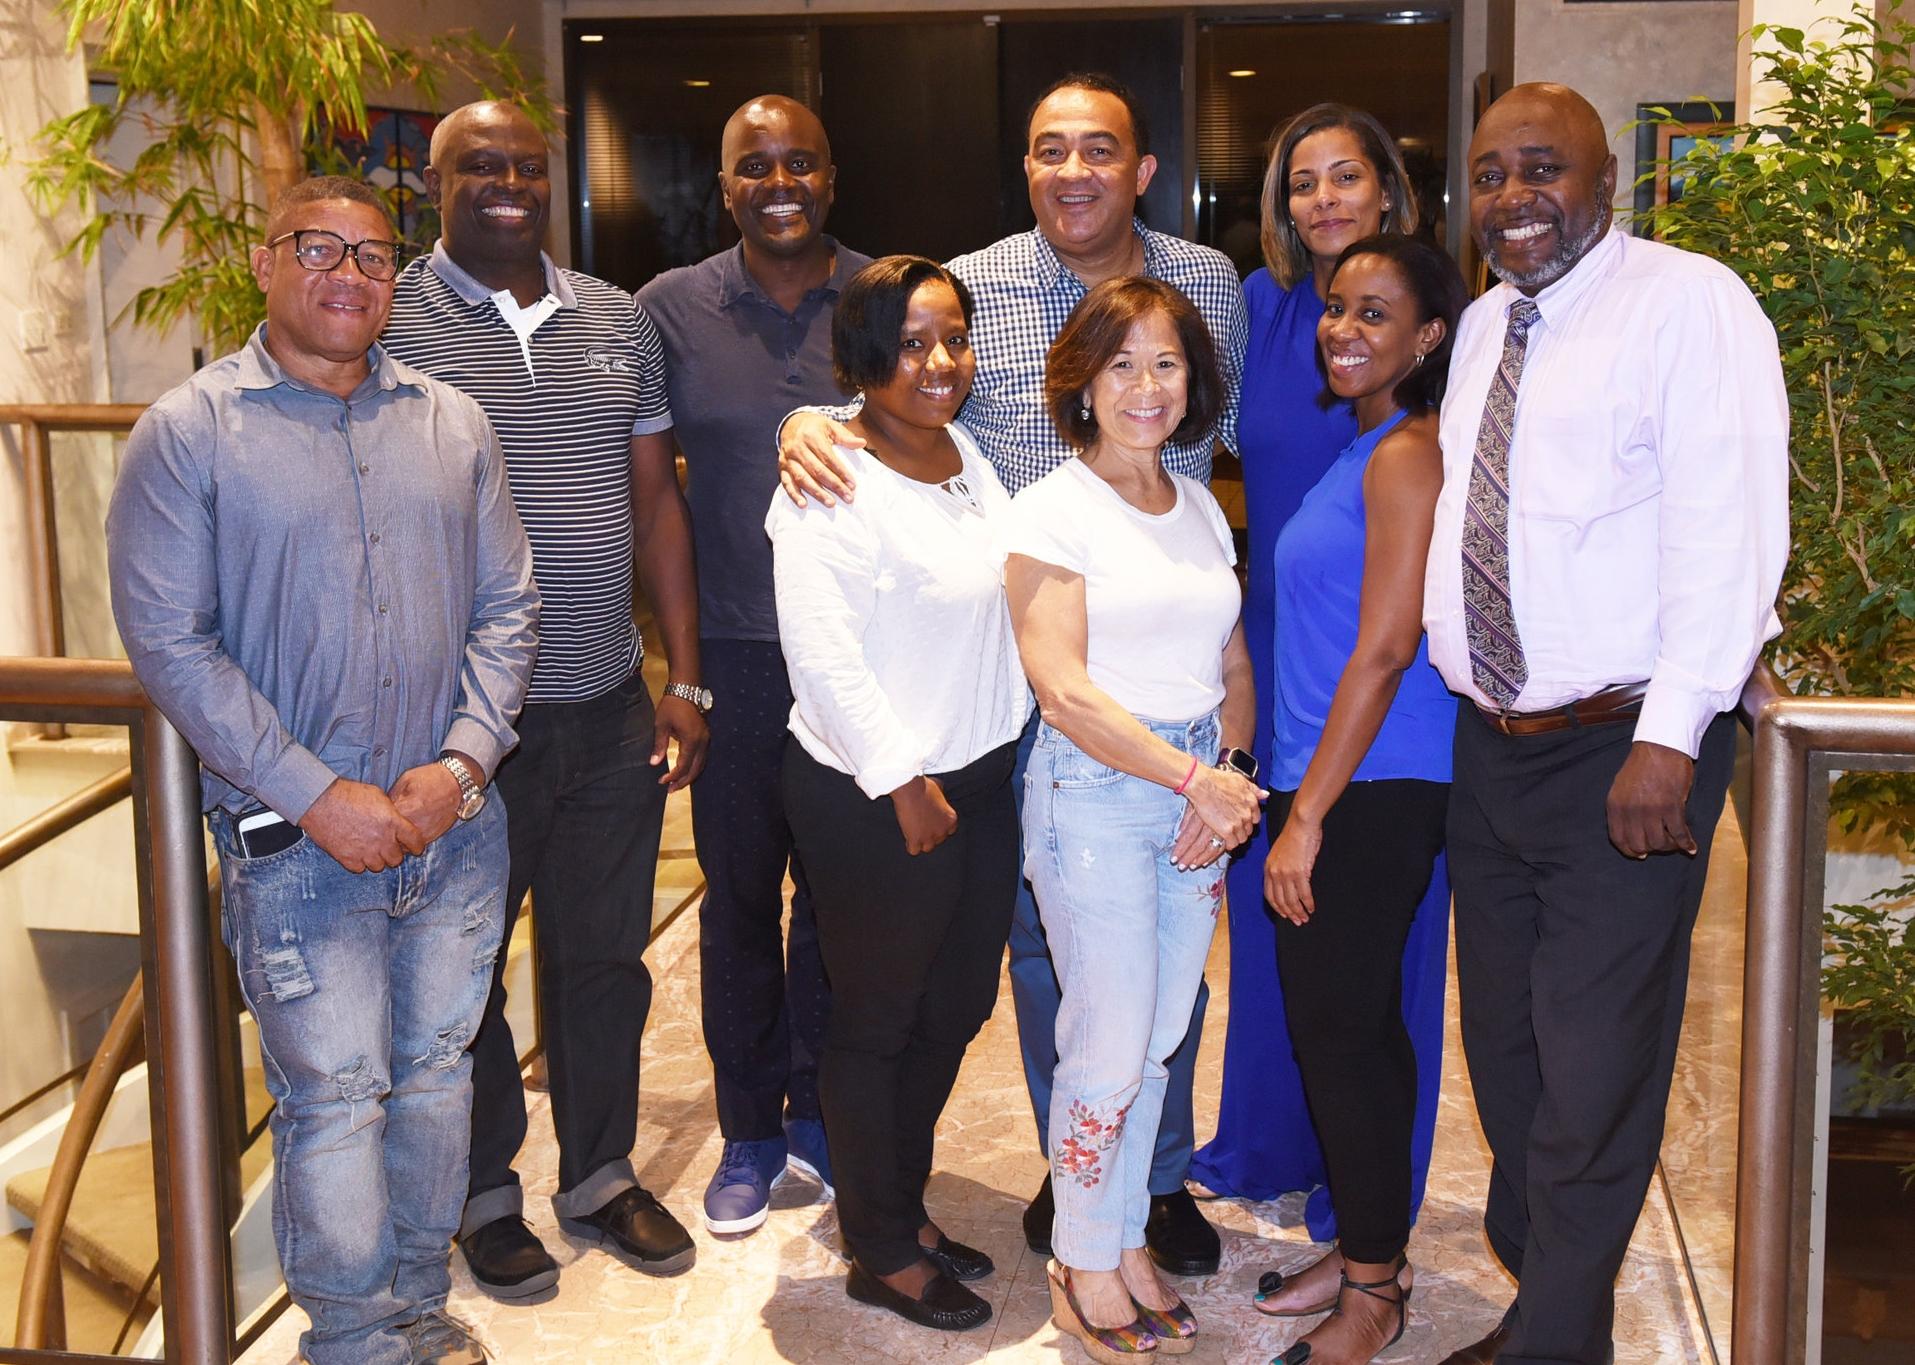 Peter Bogle (l), Brian James, Wes Hall, Kiesha Walker, Dr. Chris Tufton, Donette Chin-Loy Chang, Lyndsey McDonnough, Dr. Marsha James and Jamaica's consul general Lloyd Wilks